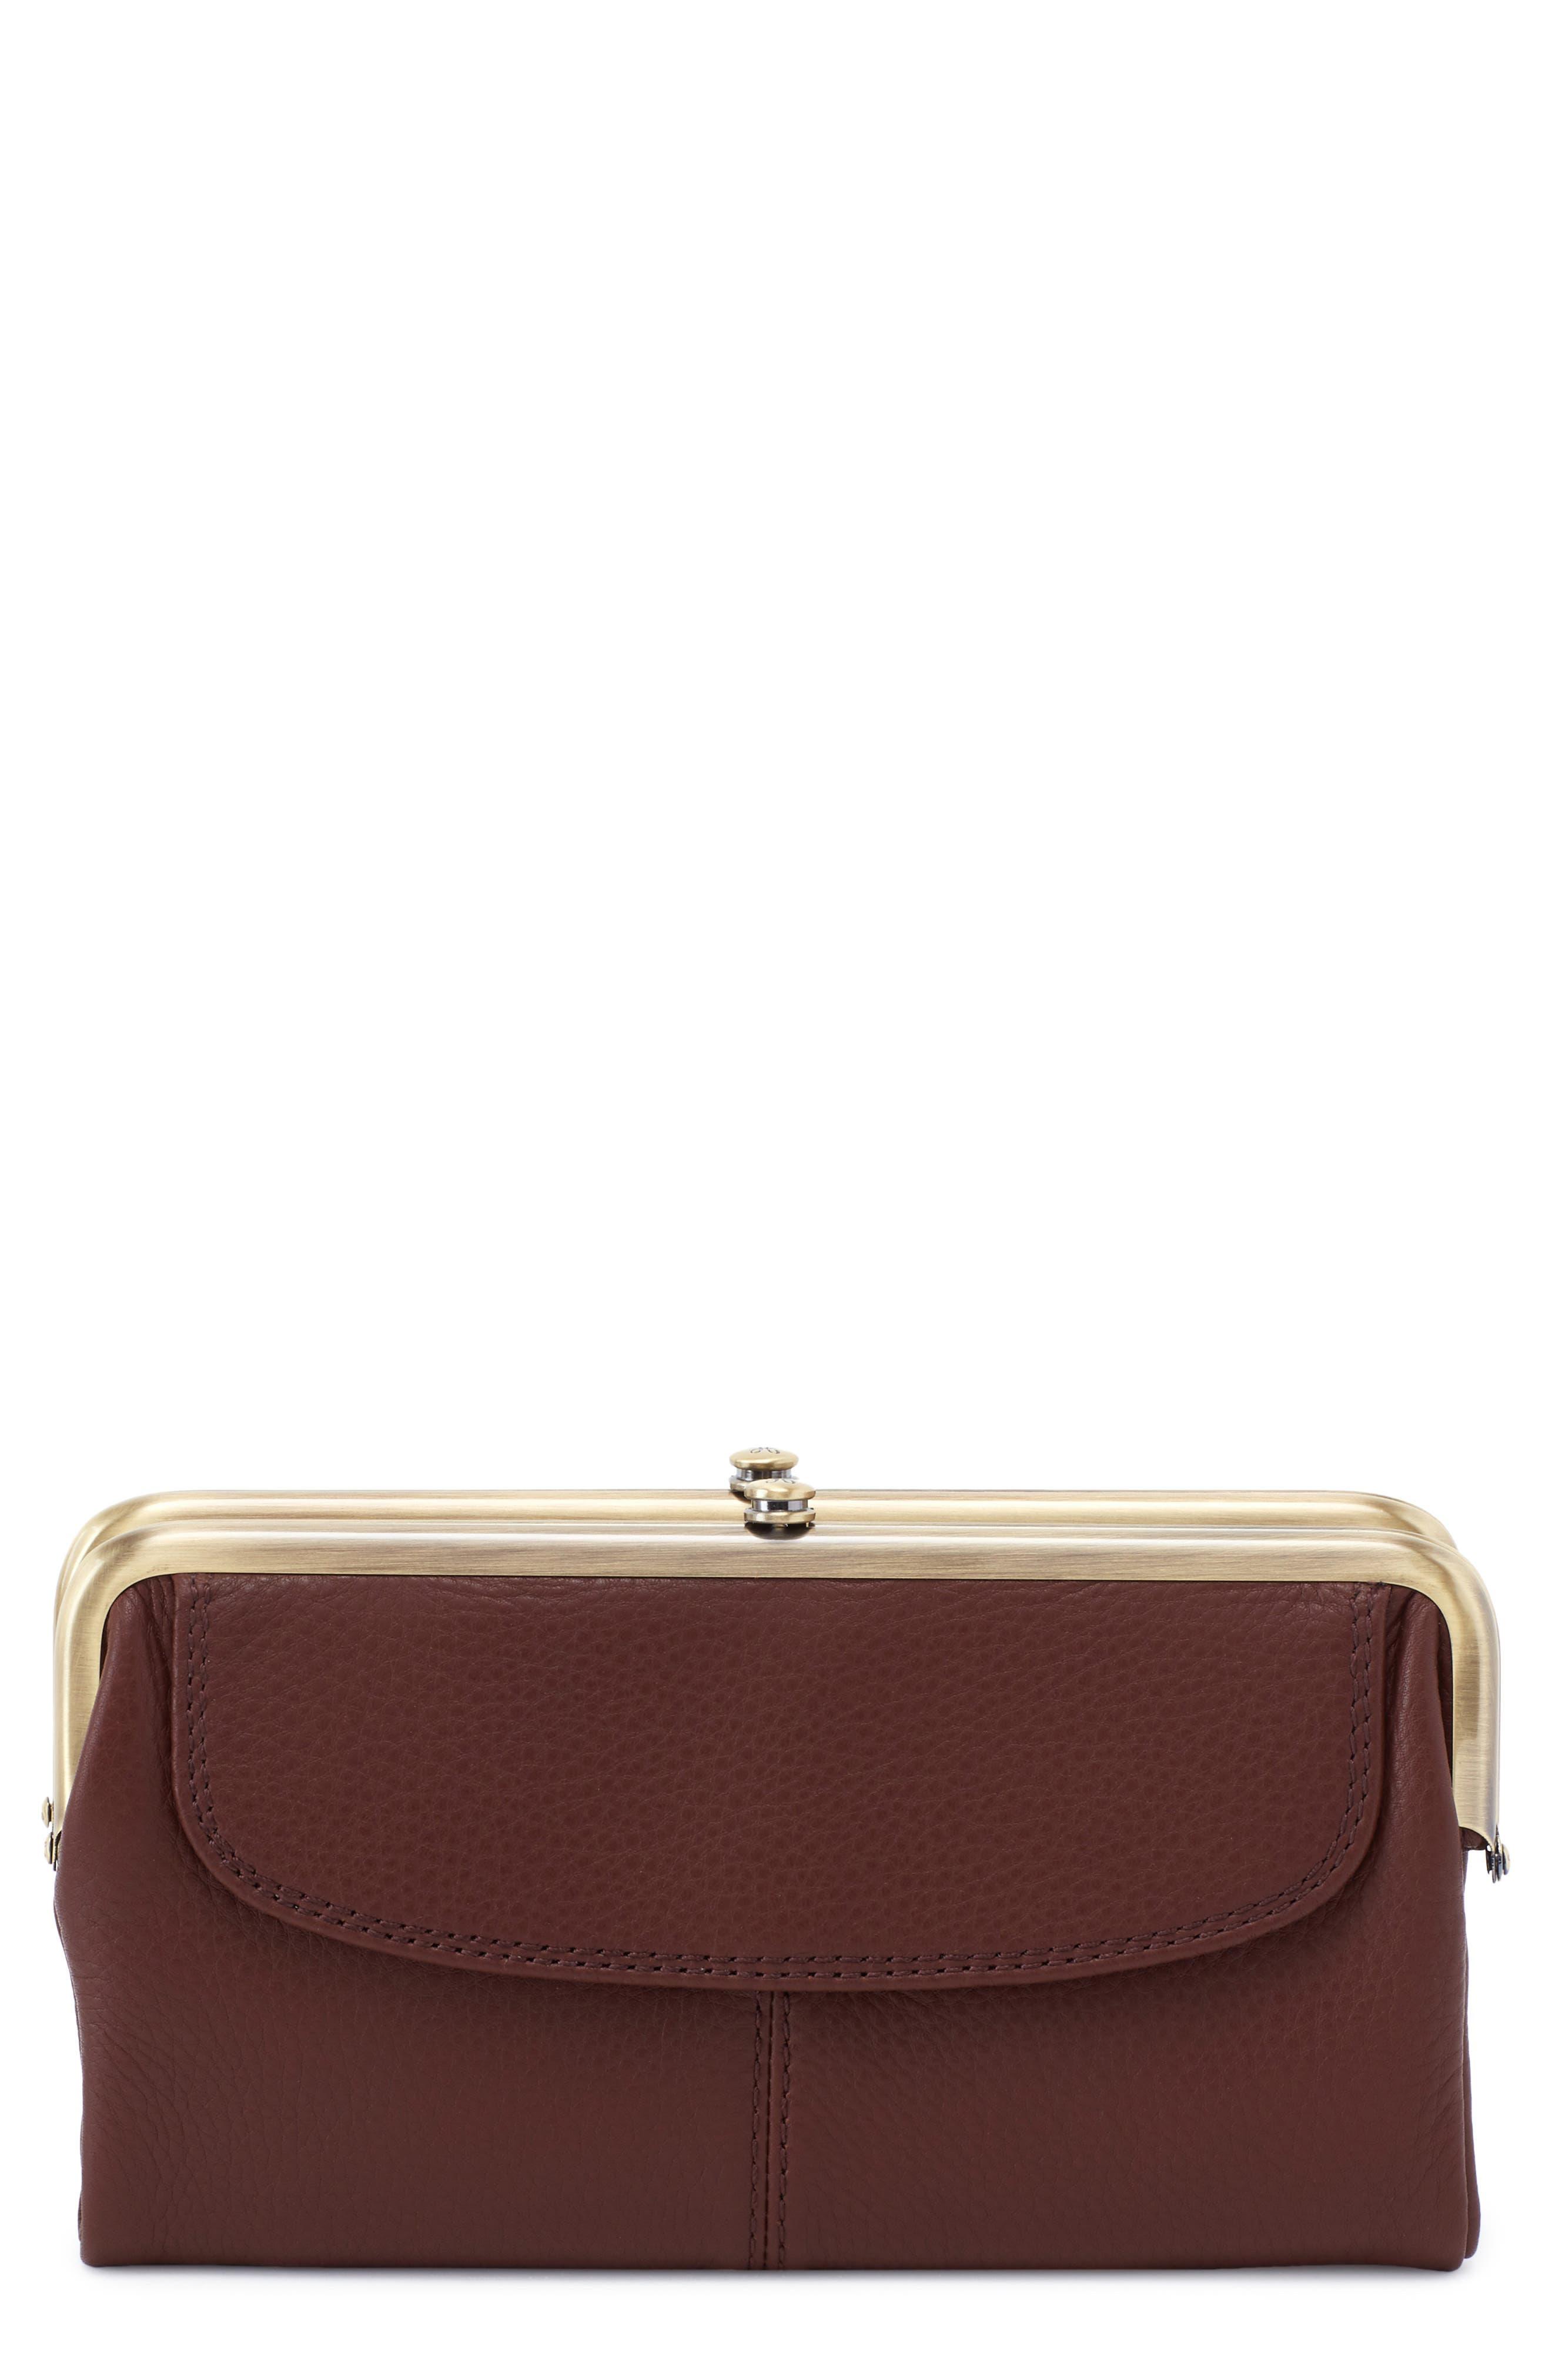 Lauren Double Frame Leather Wallet